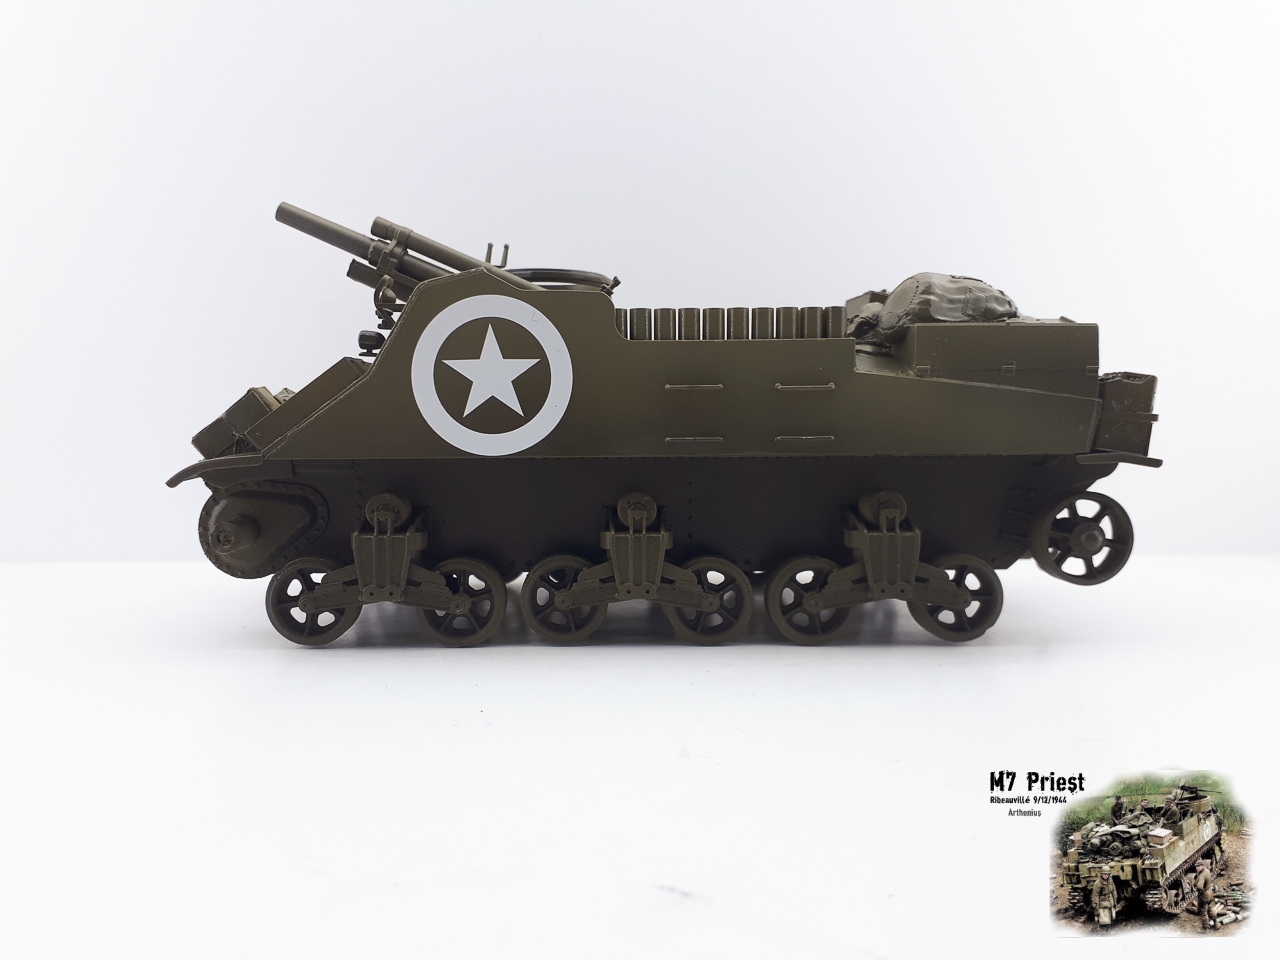 M7 Priest Ribeauvillé 9/12/1944 - Page 2 2018-085